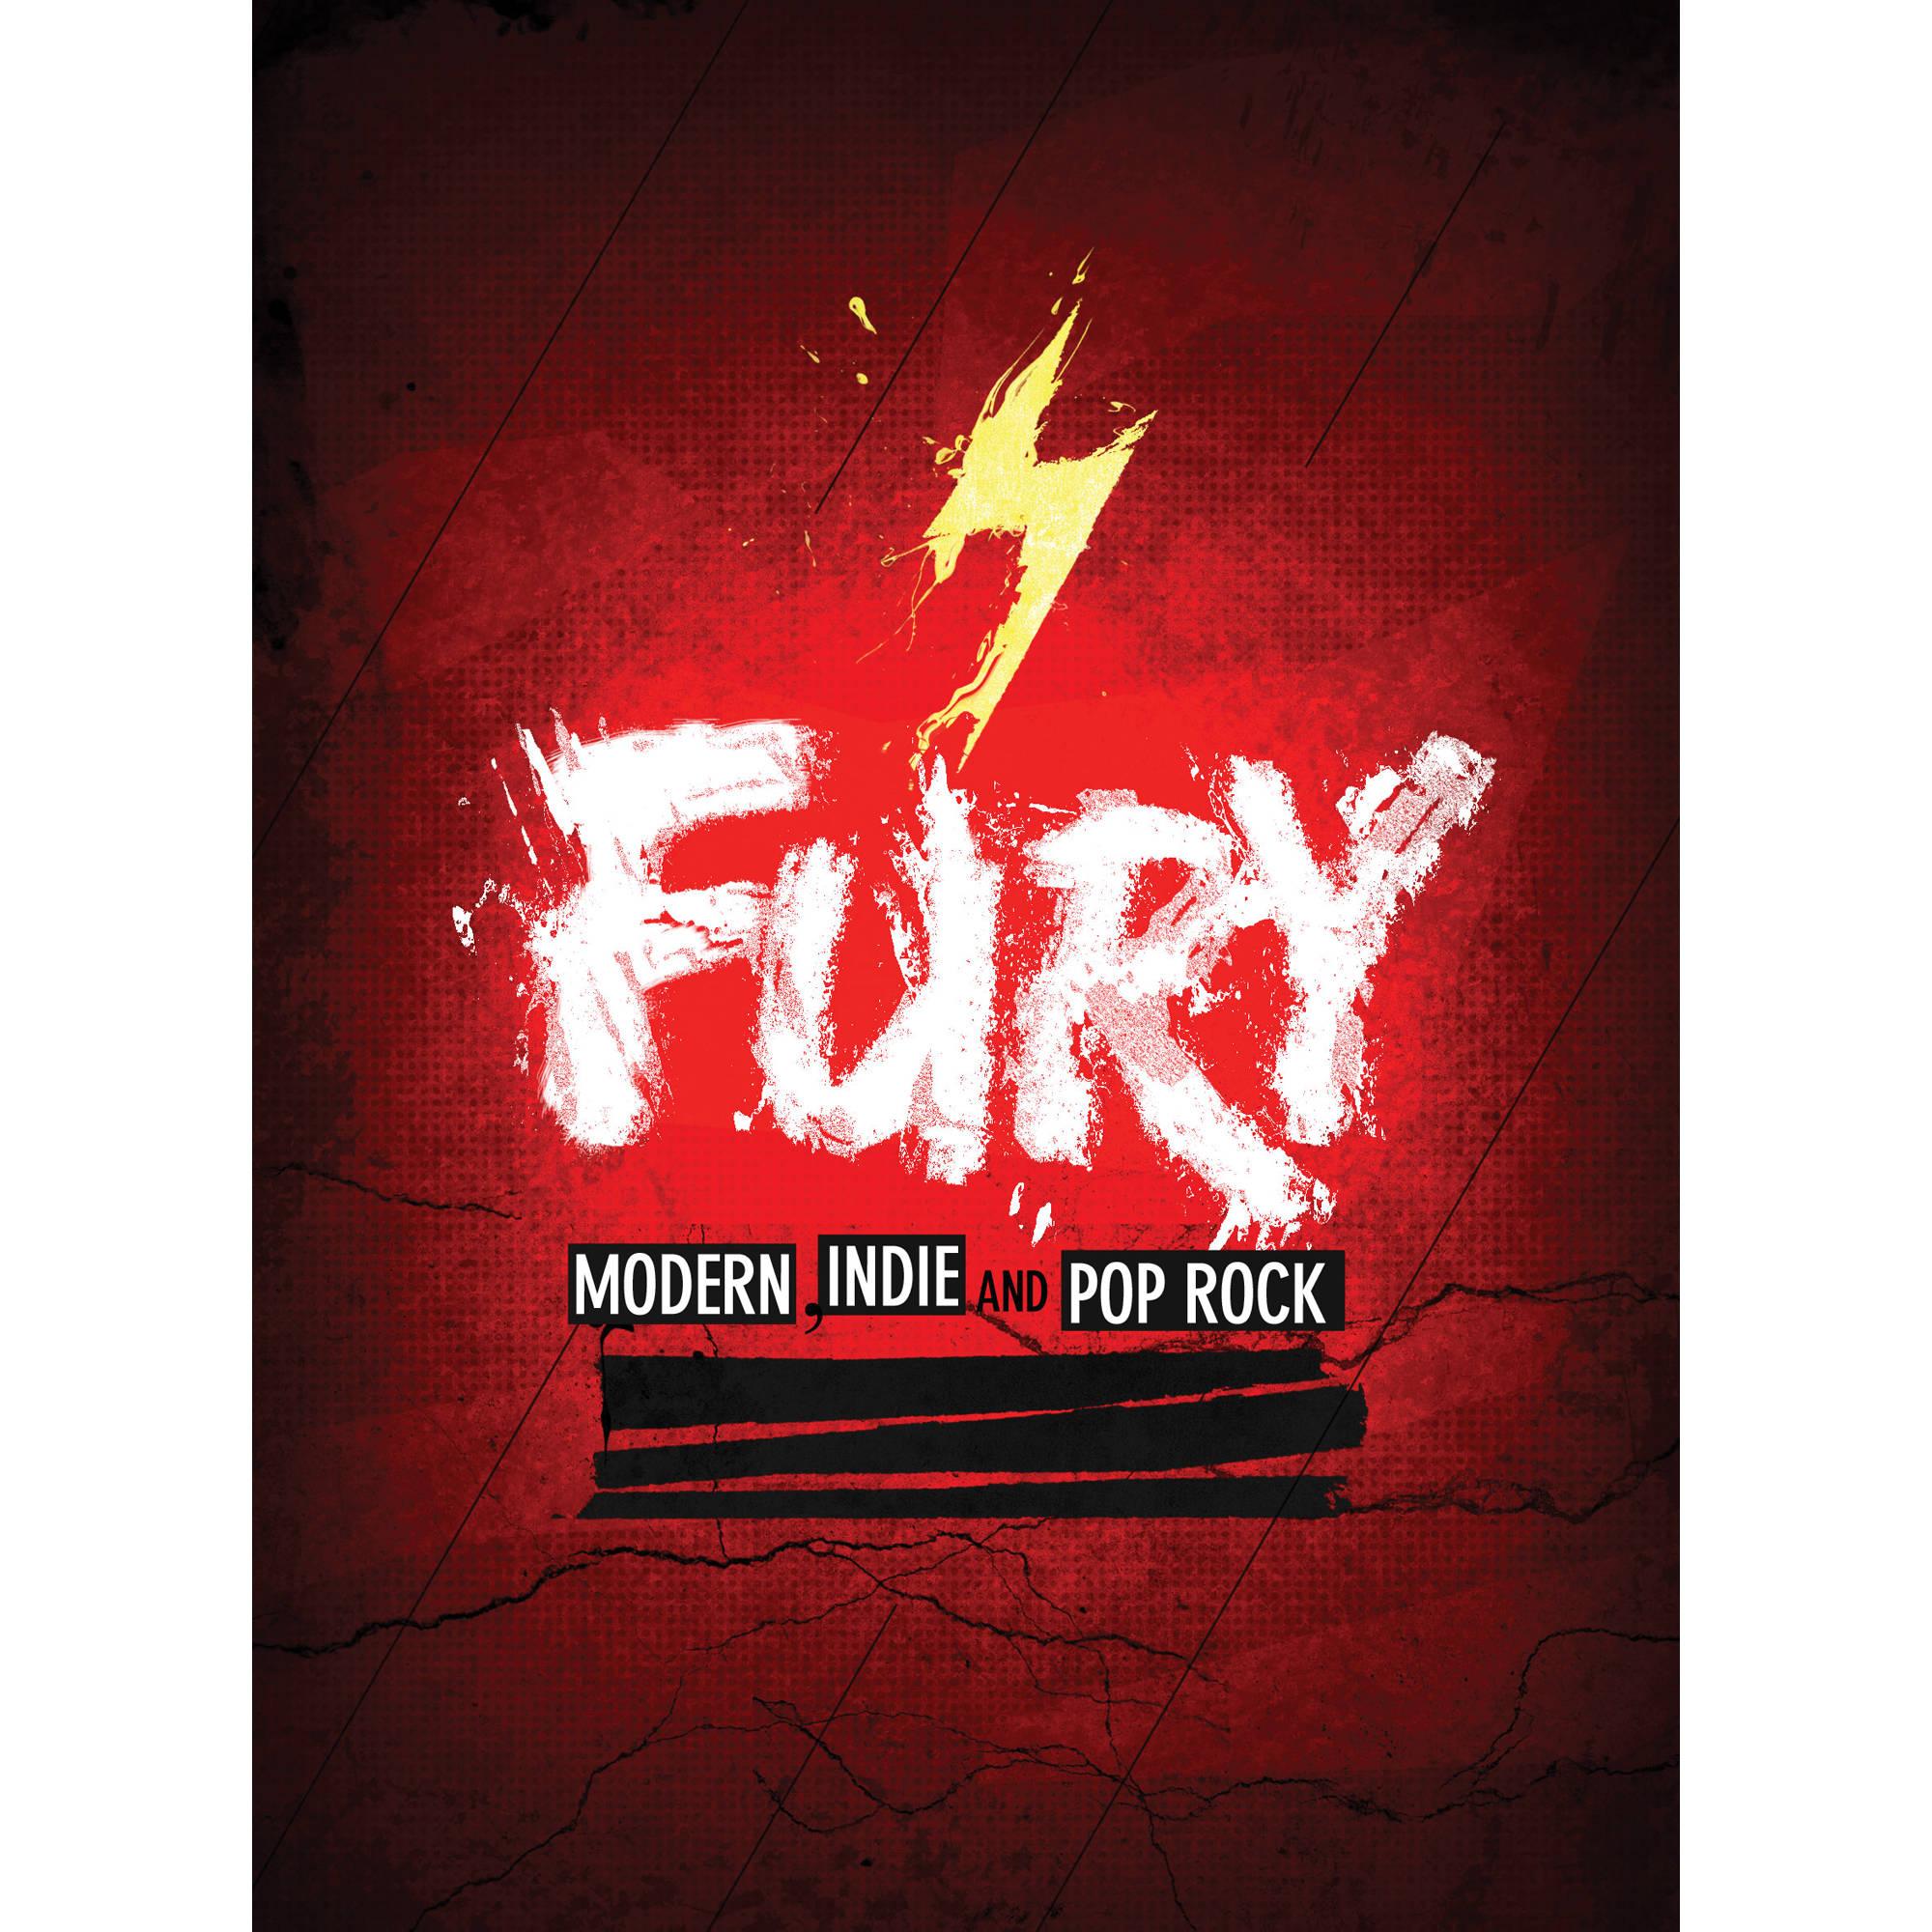 Big fish audio fury modern indie and pop rock xdgp18 k4orwxz for Big fish audio